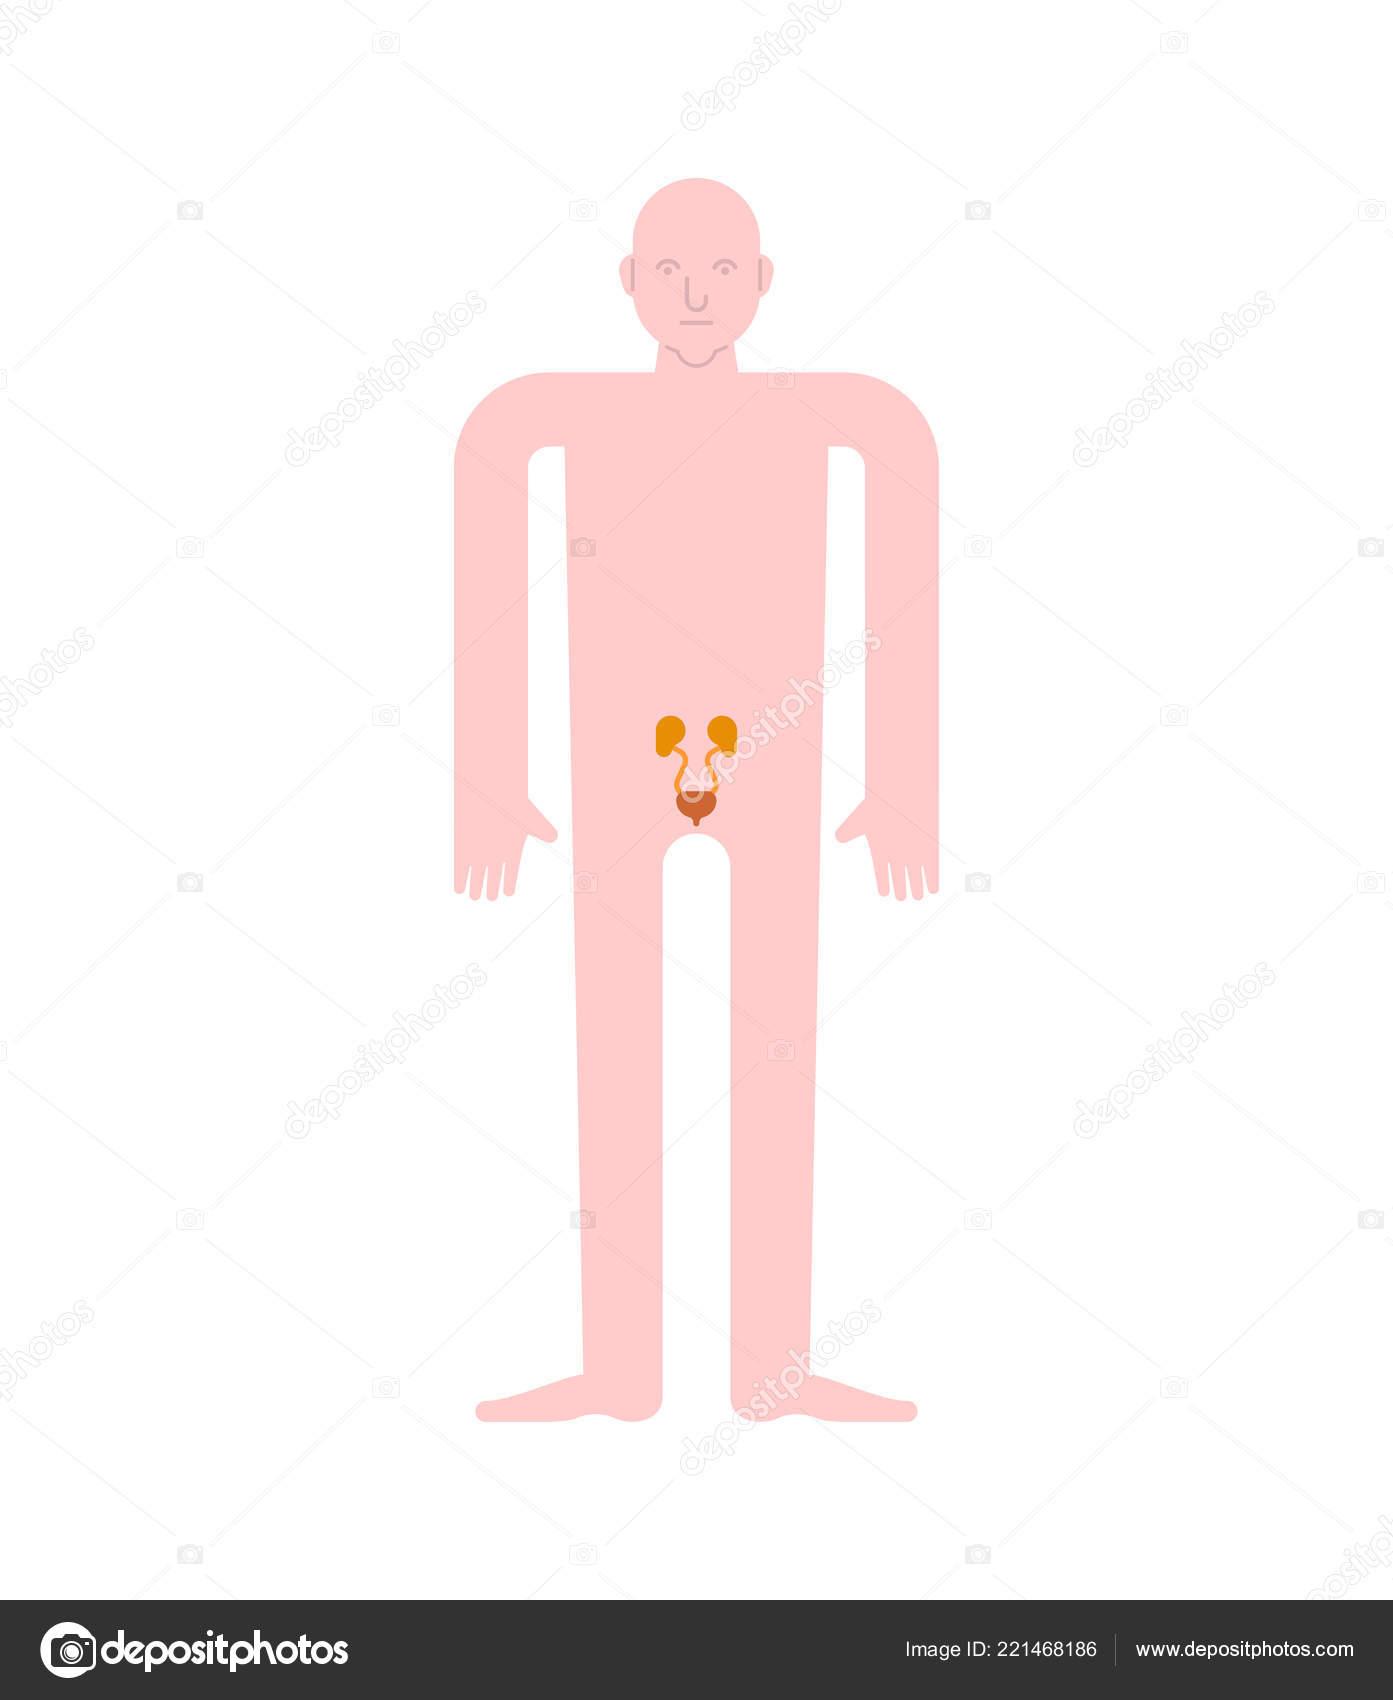 Kidney Bladder Human Anatomy Gastrointestinal Tract Internal Organs